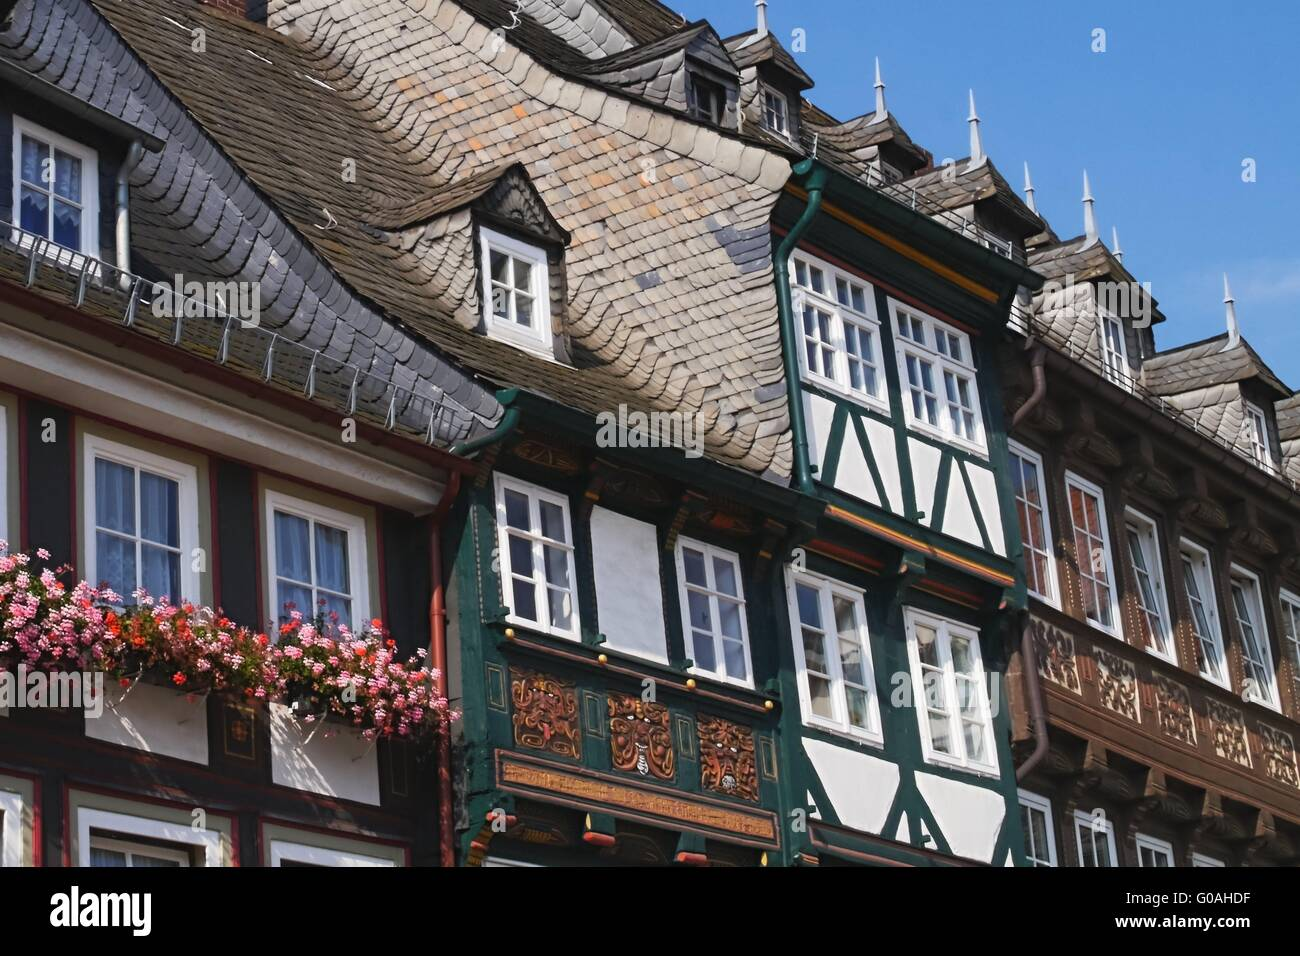 Goslar - Half-timbered houses on Schuhhof - Stock Image